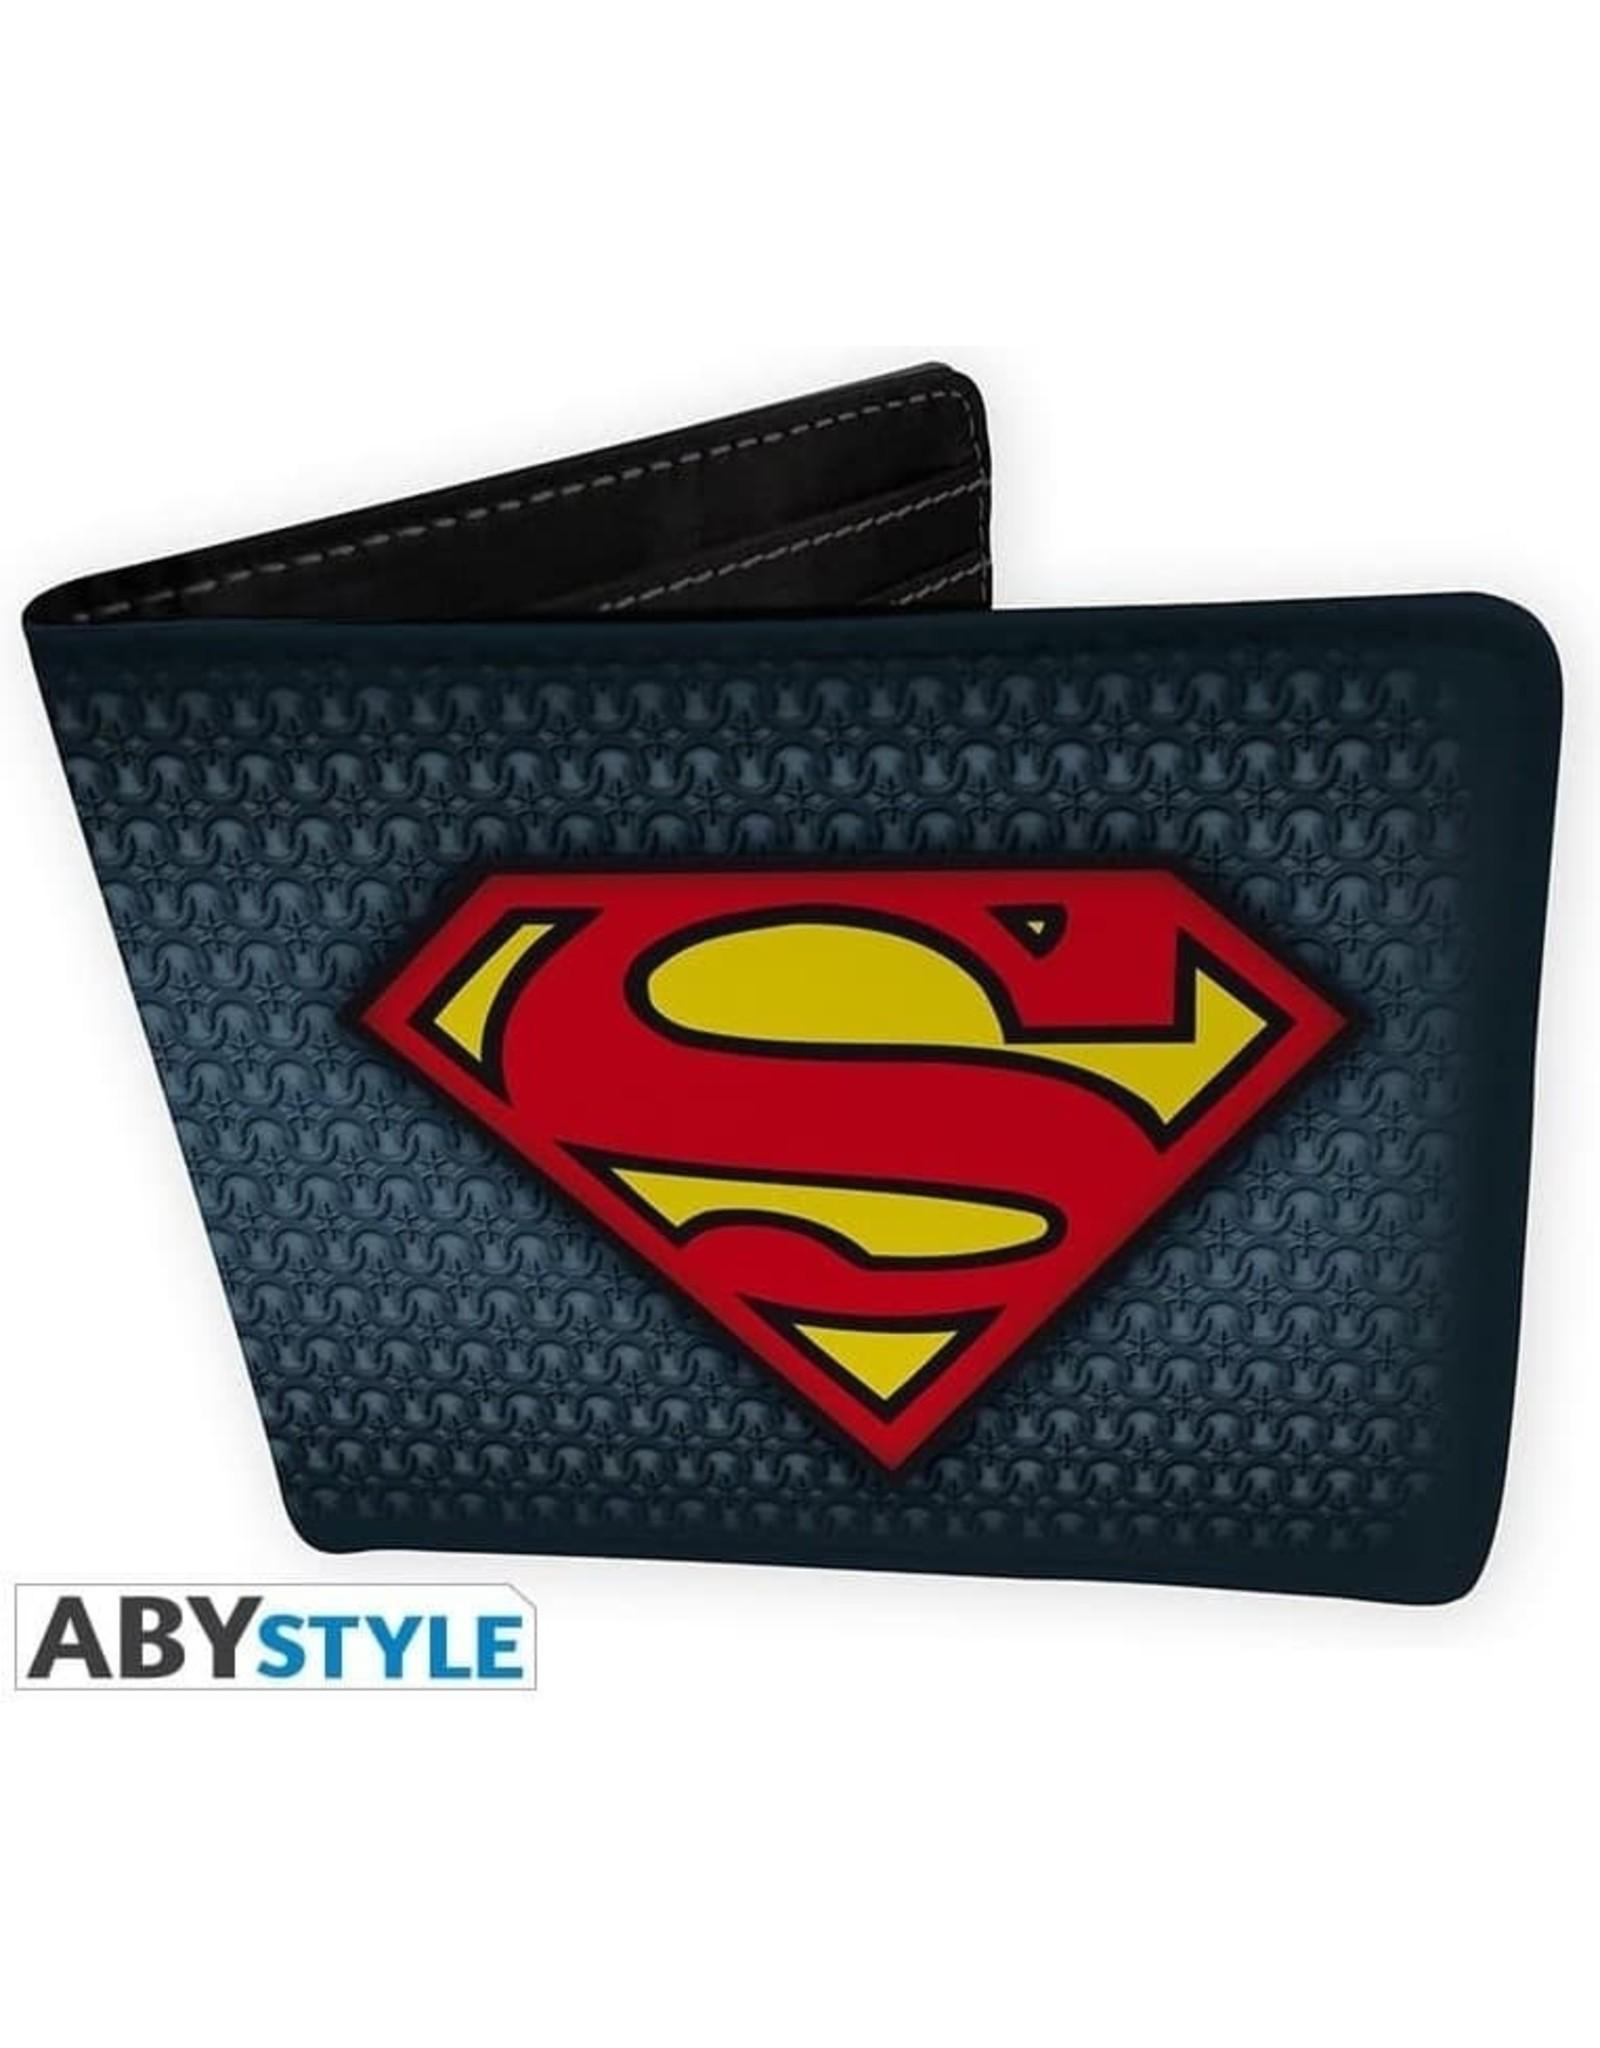 DC Comics Mechandise wallets - DC Comics Superman wallet